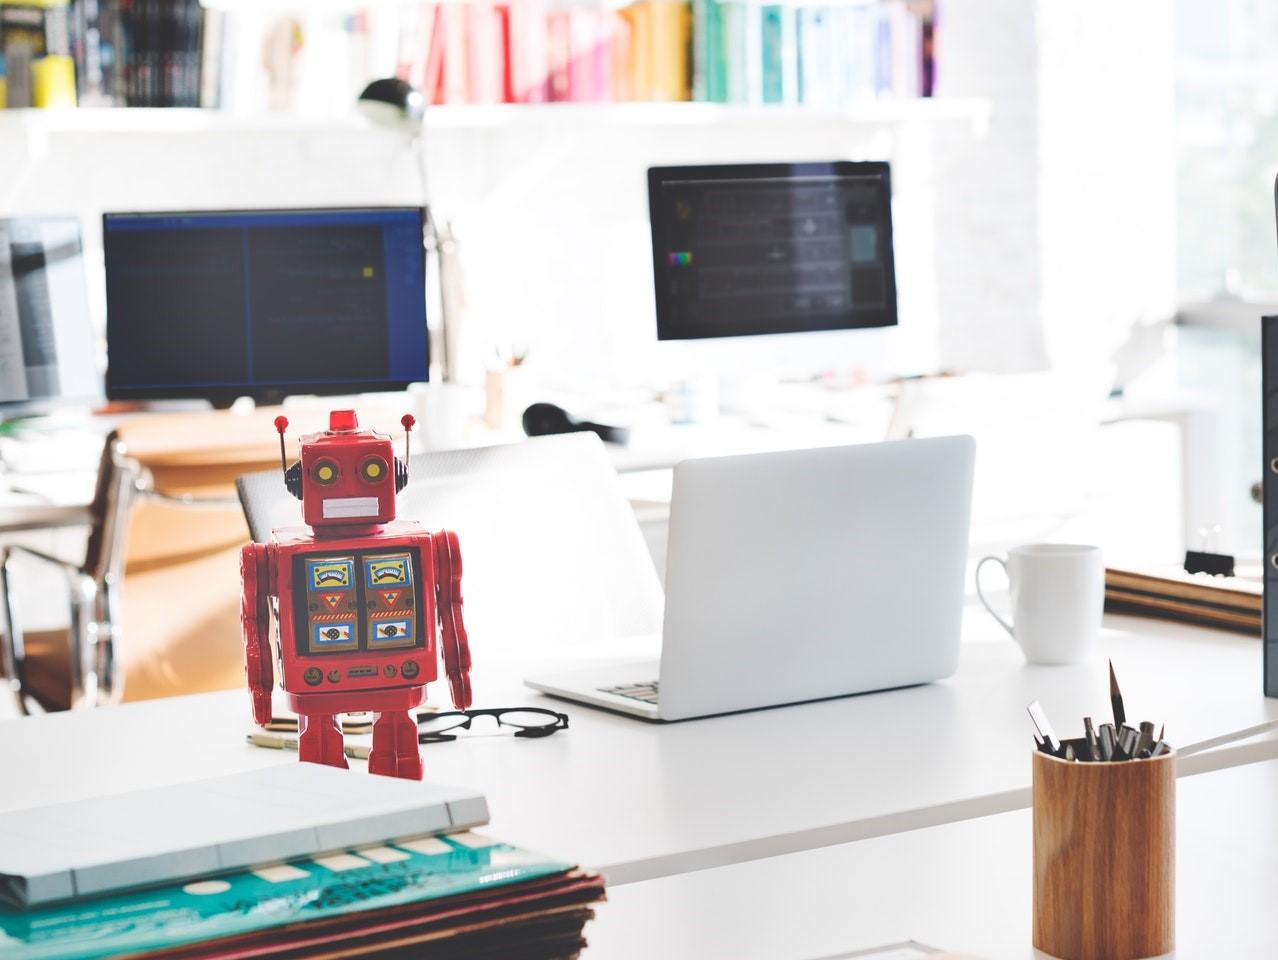 ai robot on a white desk